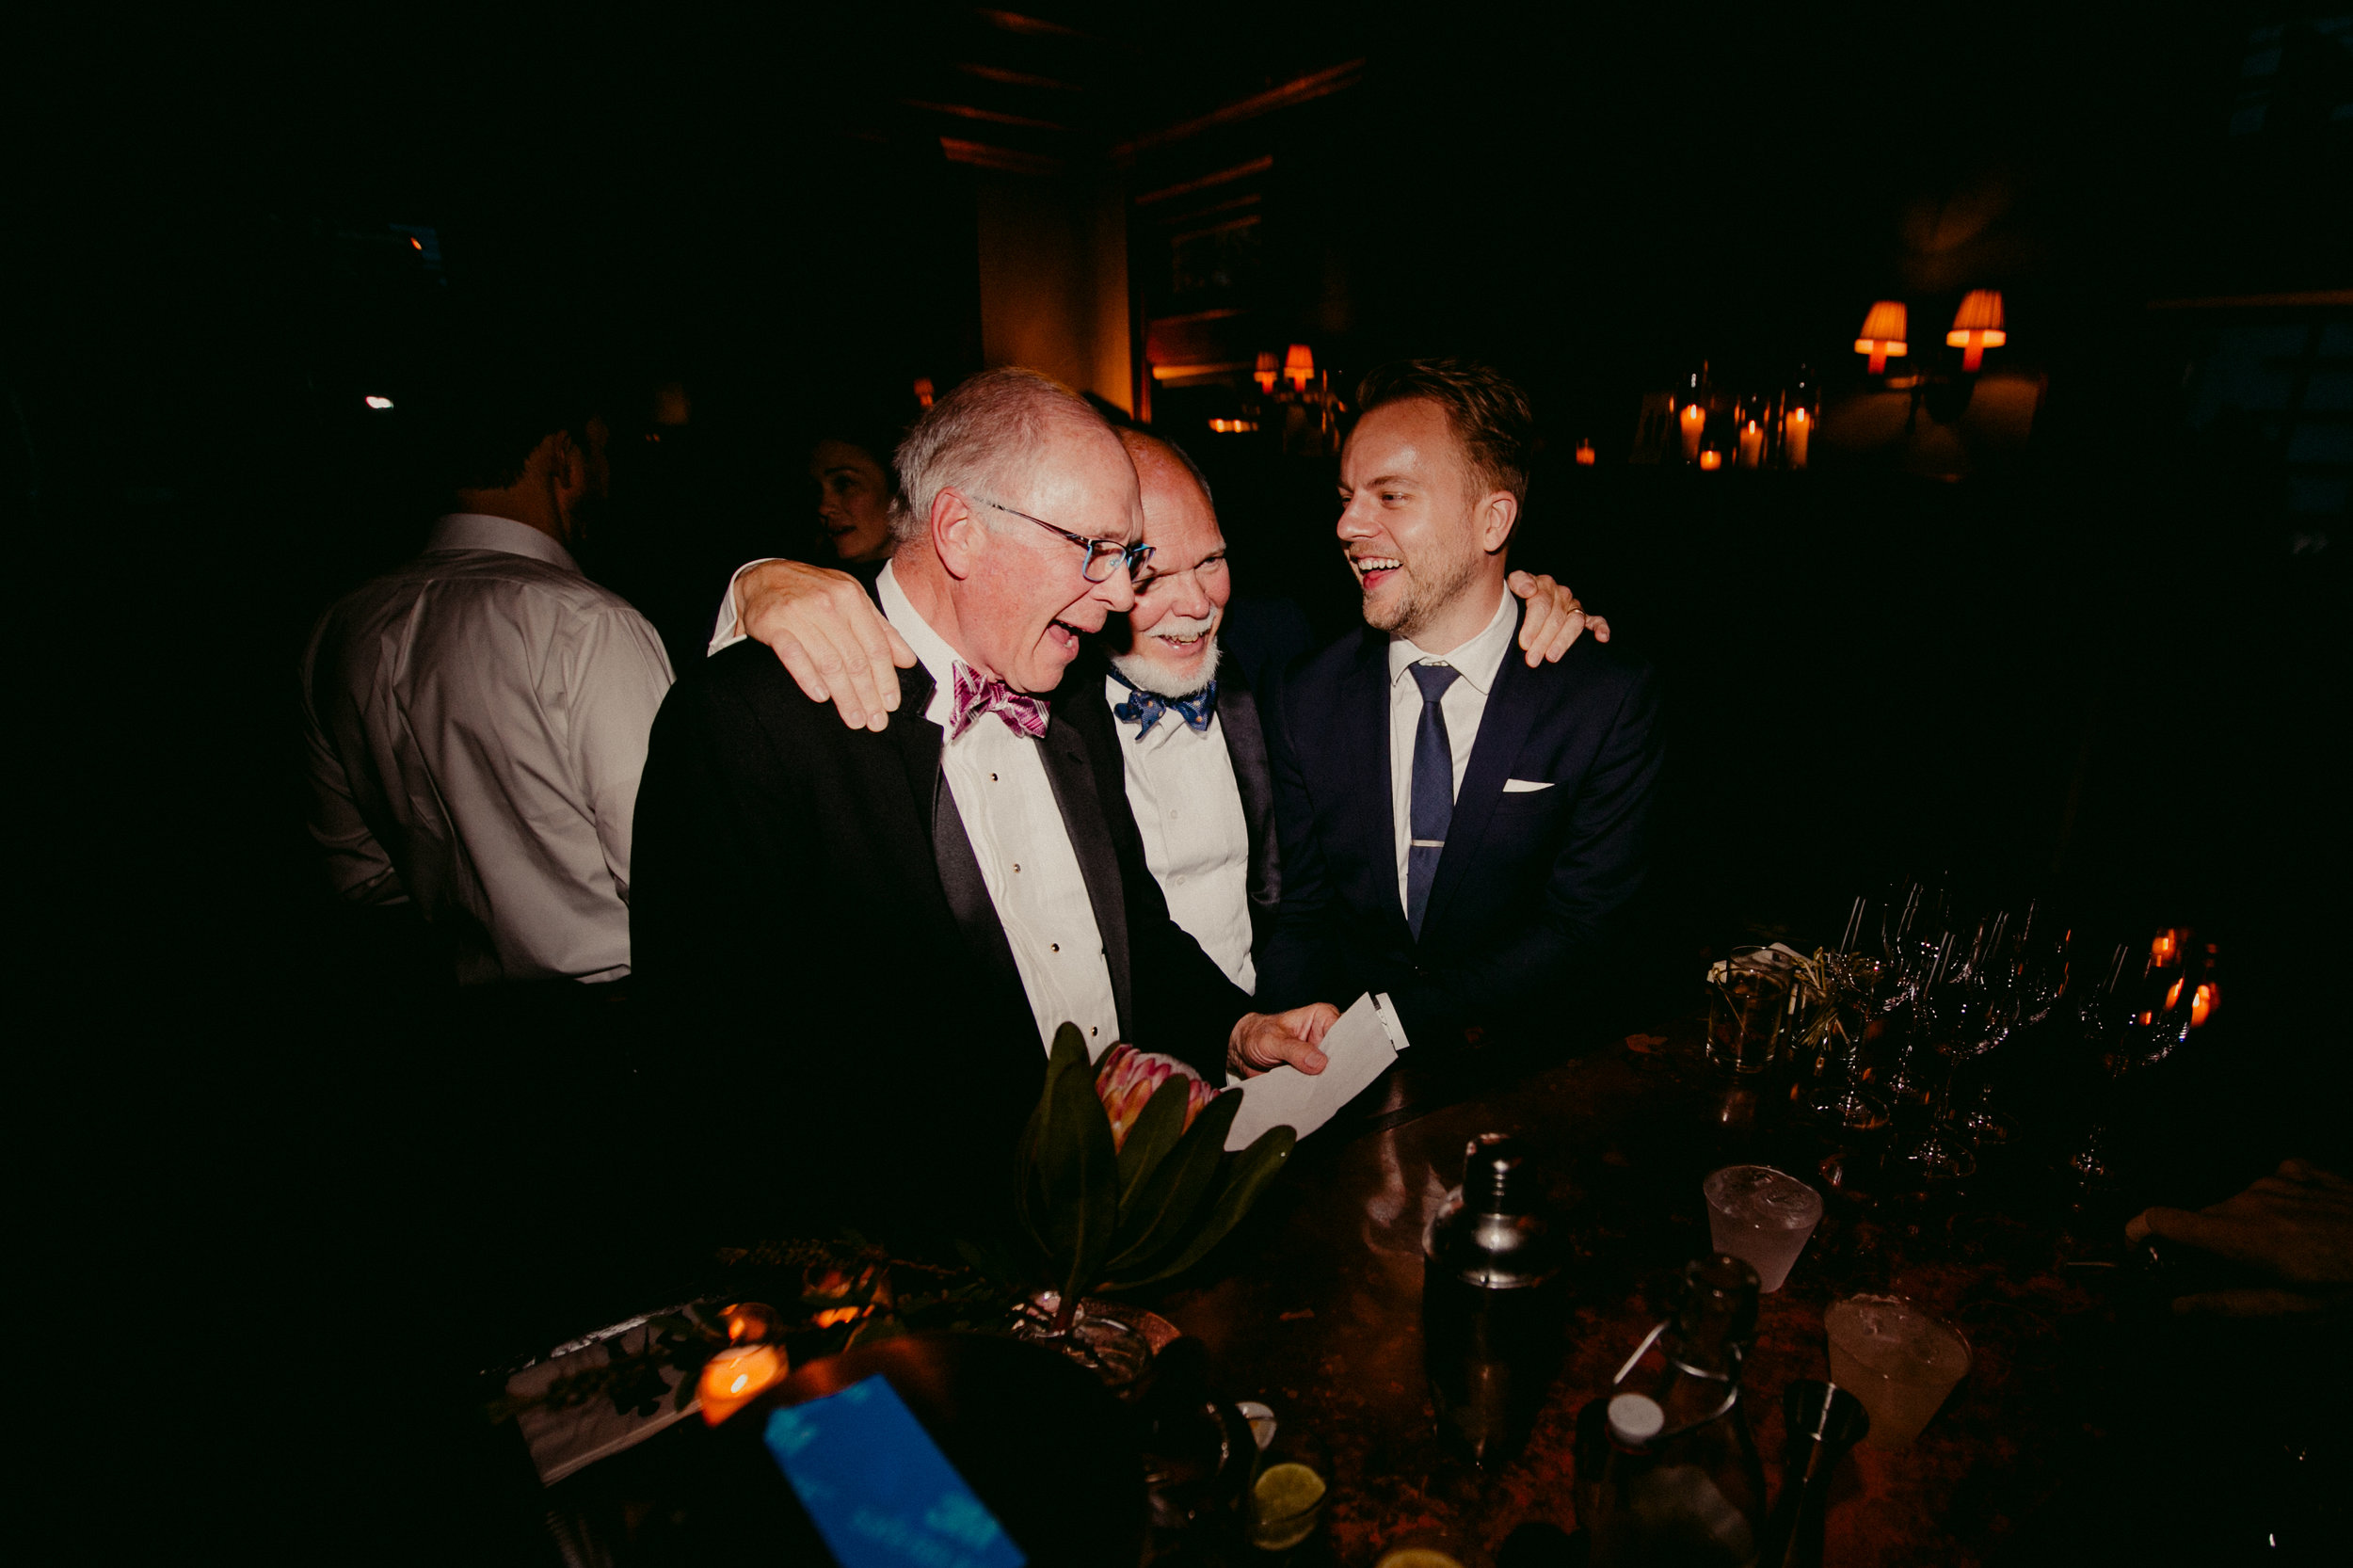 Tiger_House_The_Inn_at_Hudson-Wedding_Chellise_Michael_Photography-443.jpg